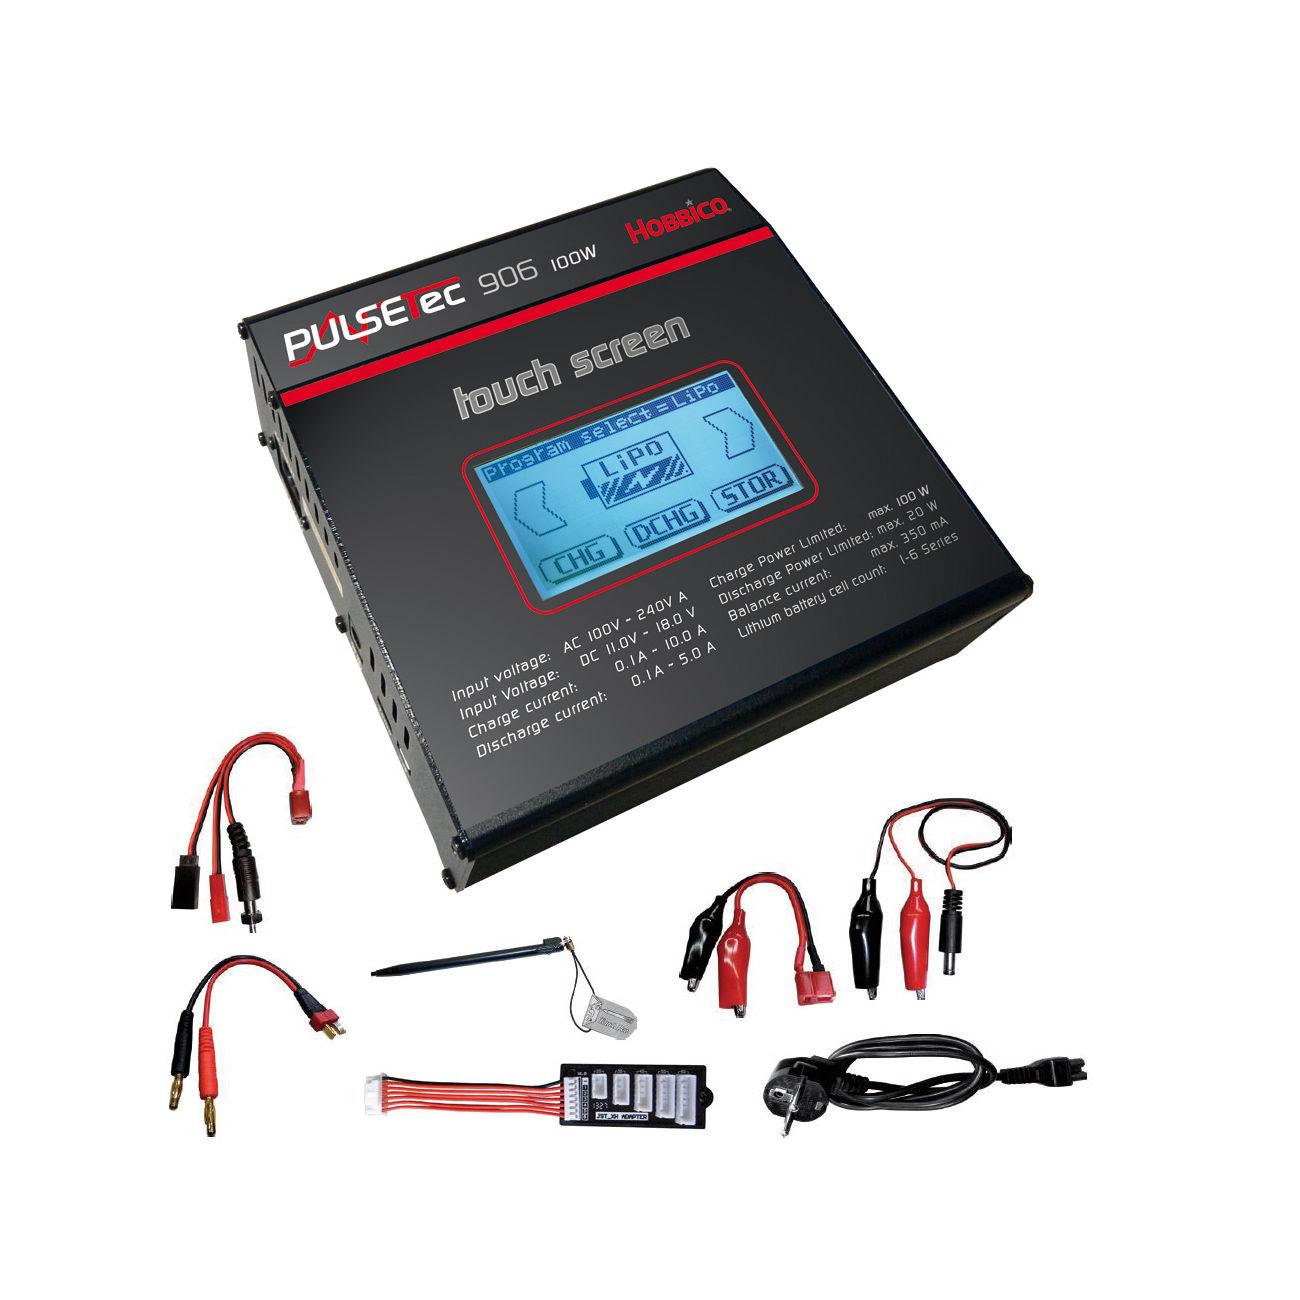 Hobbico pulsetec 906 touch screen ladeger t lipo nimh for Lipo schreibtisch